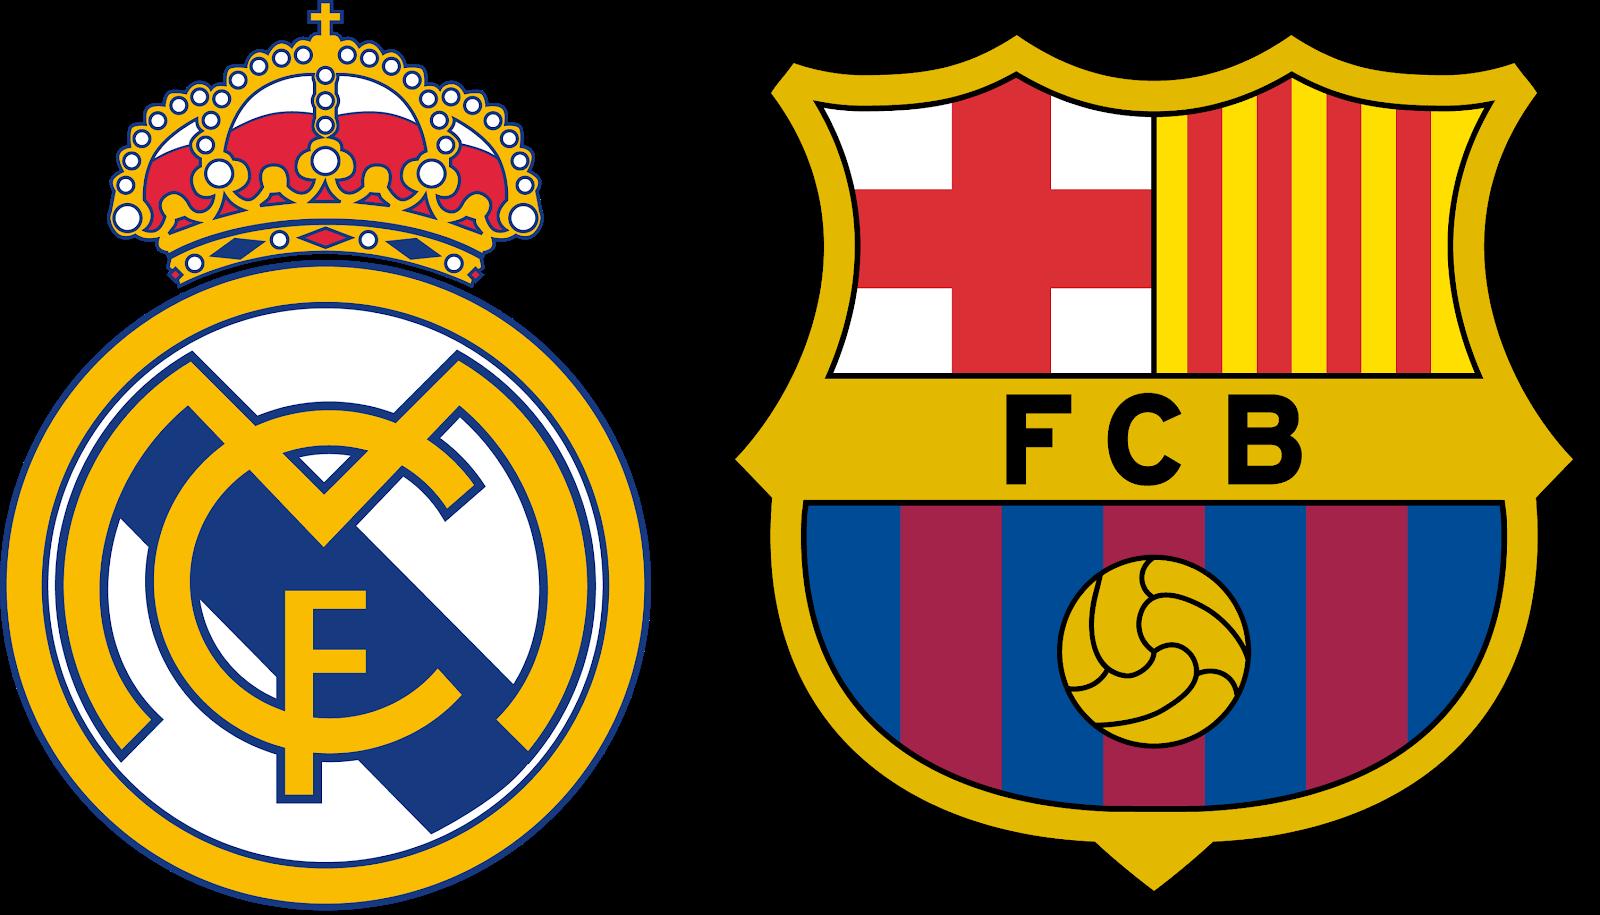 download logo fc barcelona real madrid svg eps png psd ai.